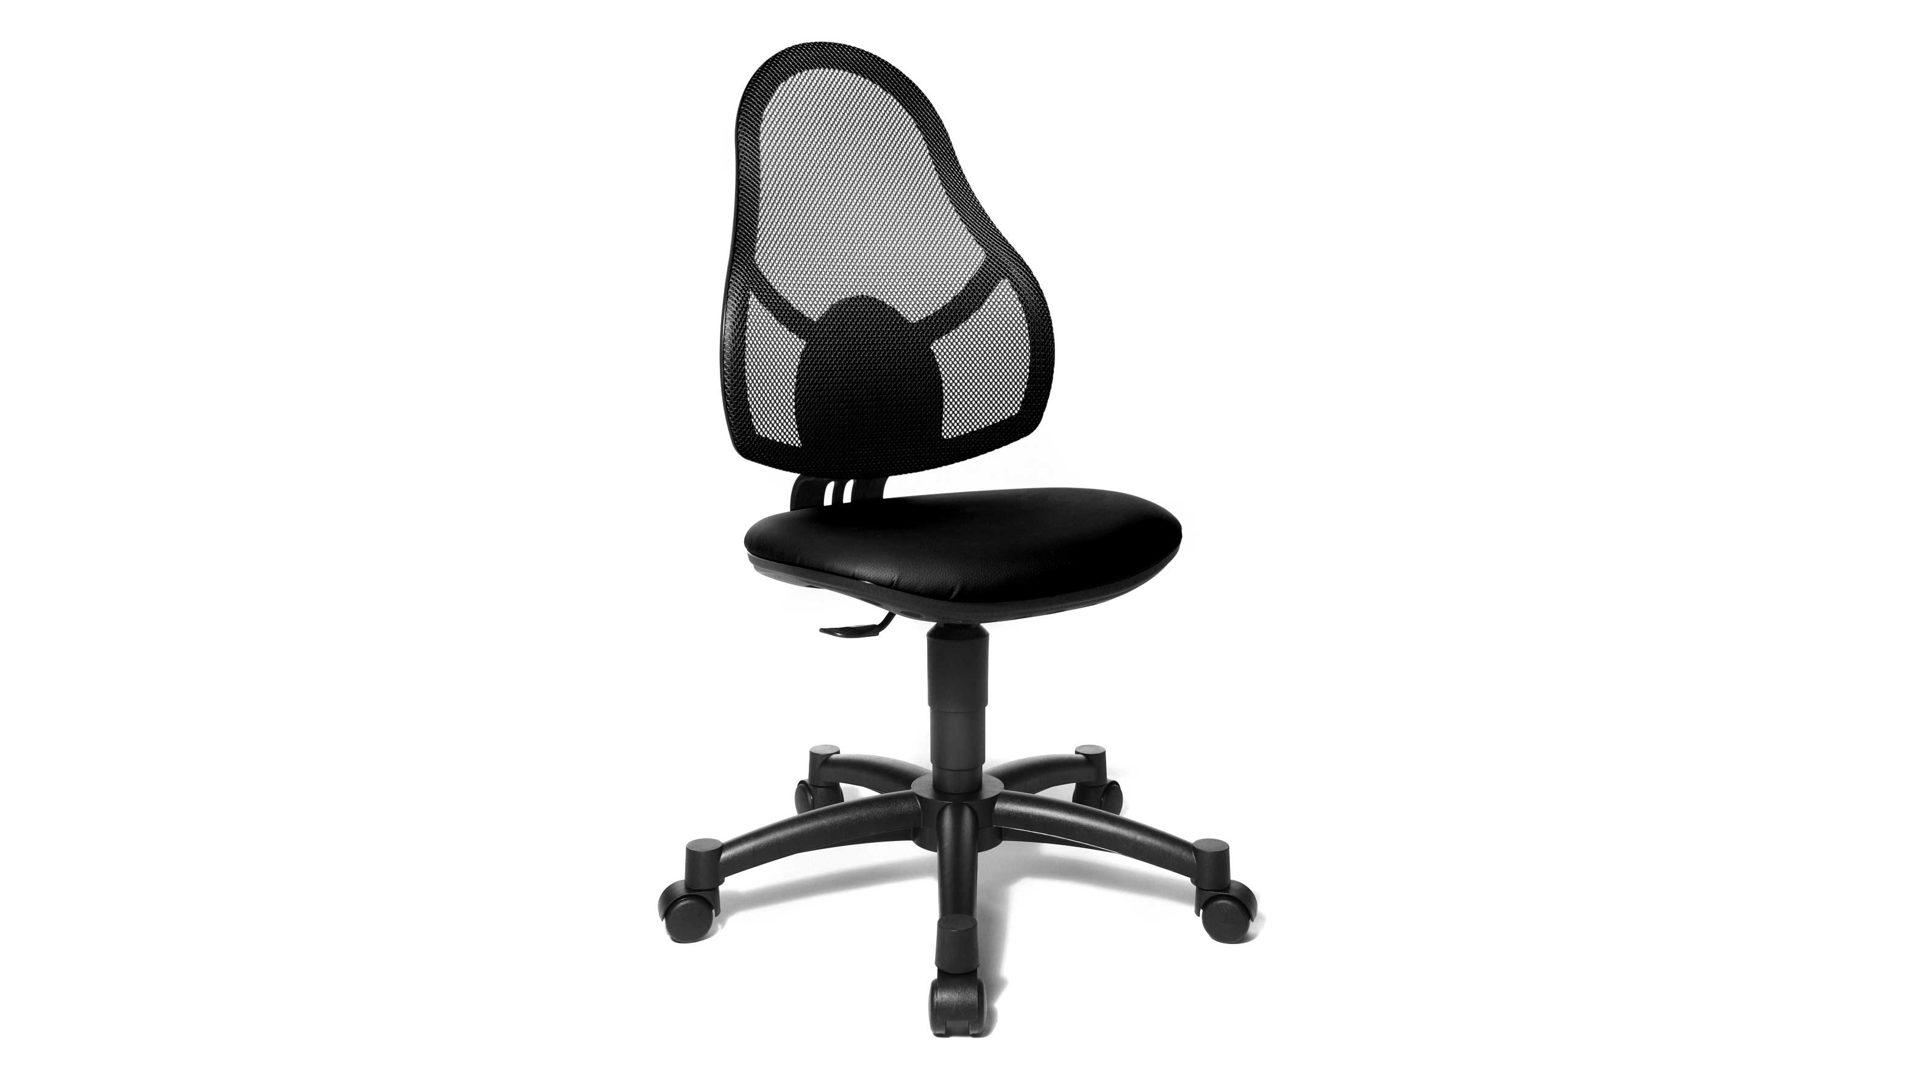 TOPSTAR Drehstuhl Schreibtischstuhl AIRGO KID 71740 S10, Bezug Stoff ...